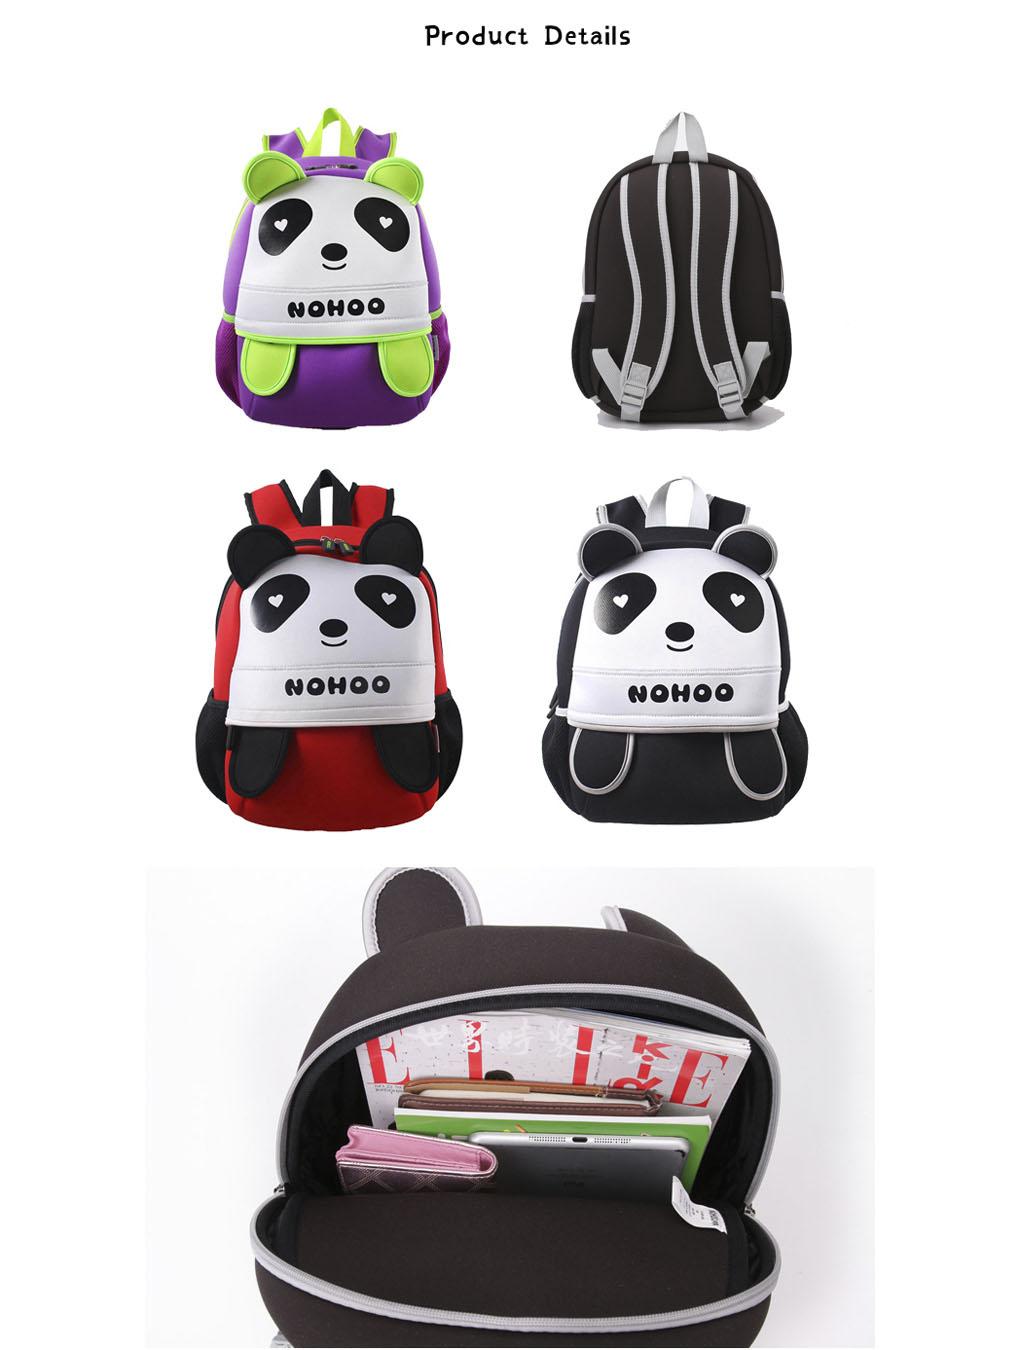 Nohoo Children Products-Neoprene Lovely Style Kids Bag 3d Panda Children Hiking School Bags